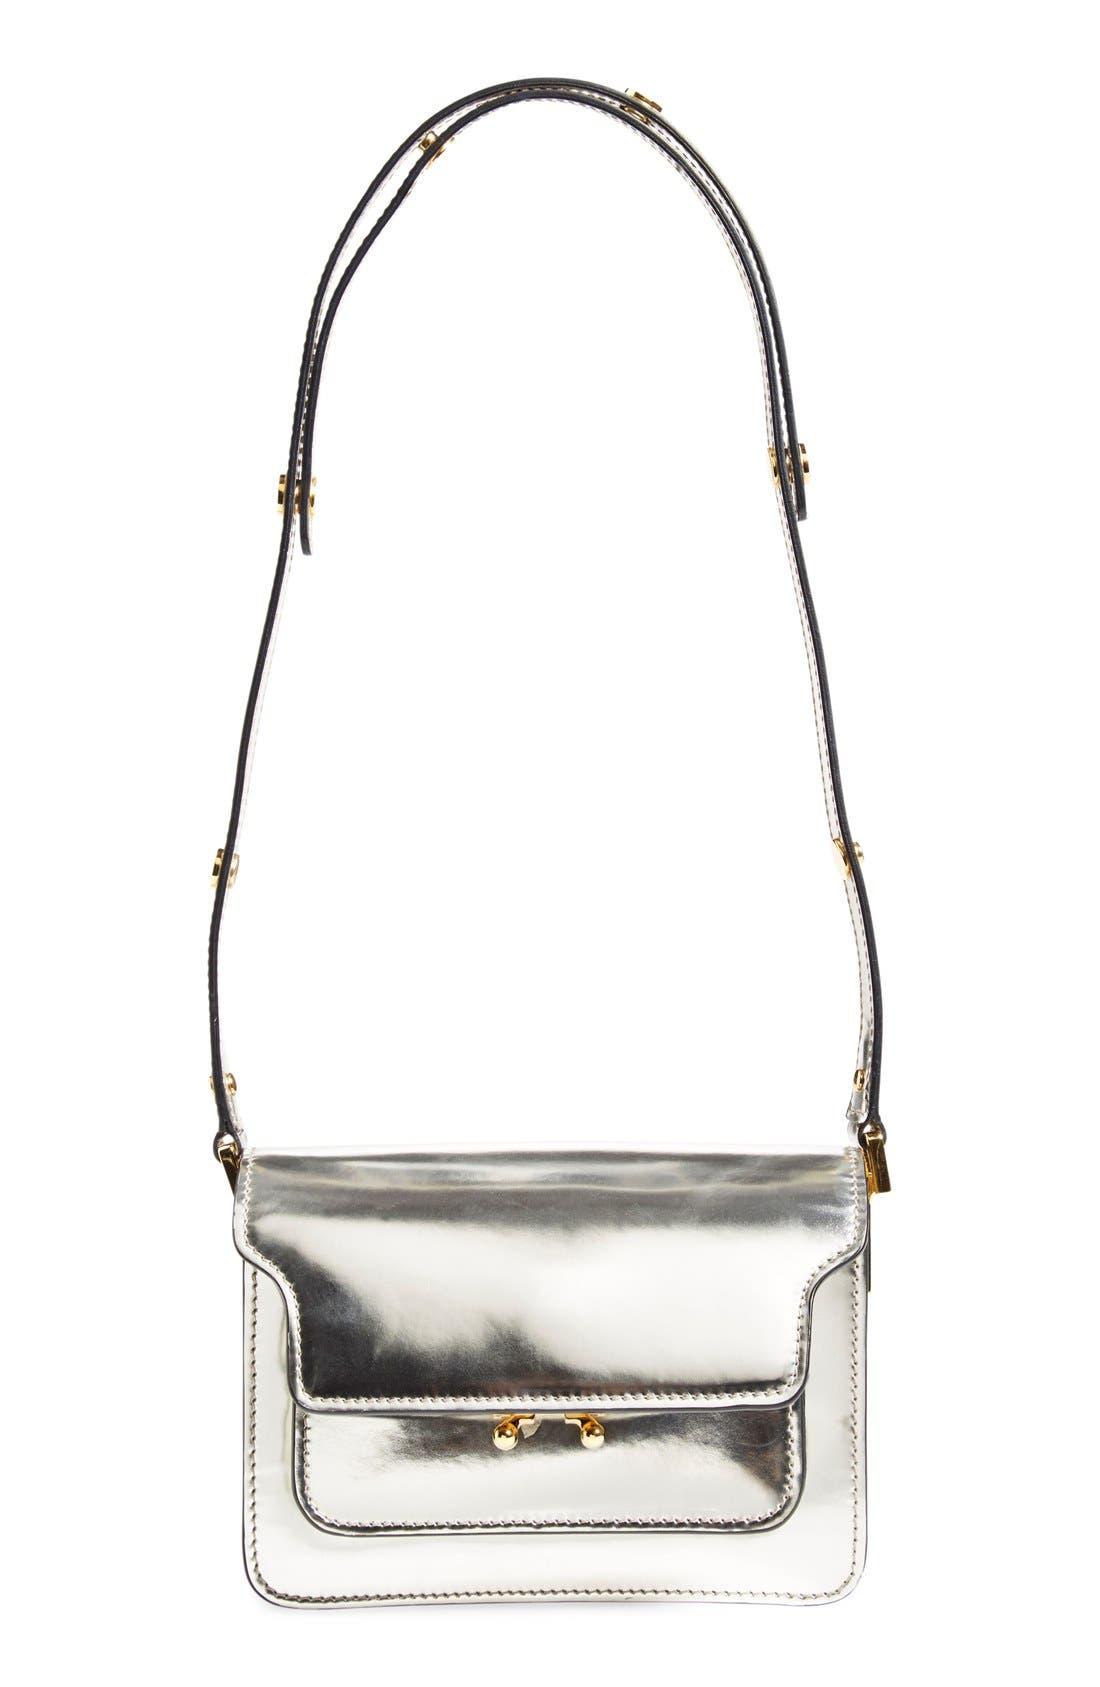 Main Image - Marni'Mini Trunk' Metallic LeatherShoulder Bag